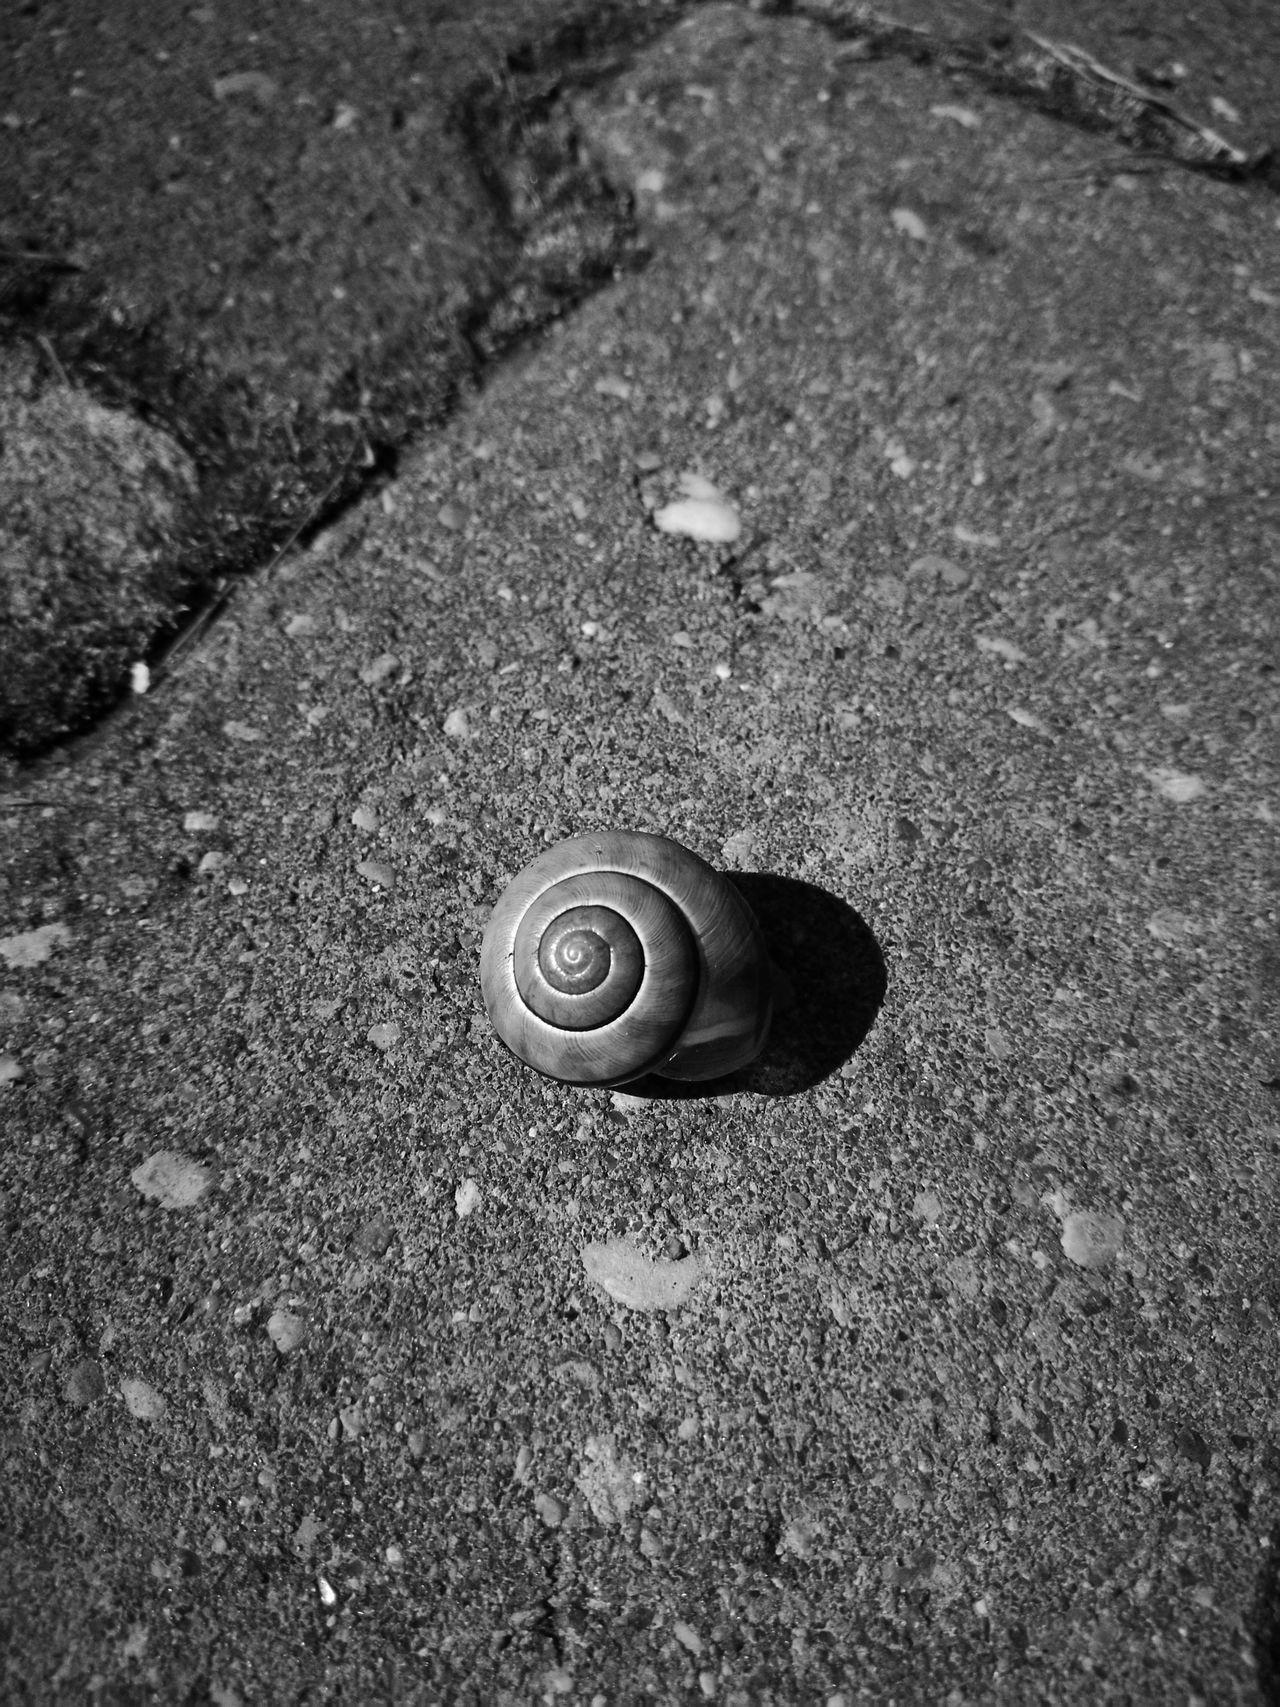 Snail Minimalism HuaweiP9 Blackandwhite Wildlife & Nature Nice Photo Taking Photos Betterandbetter